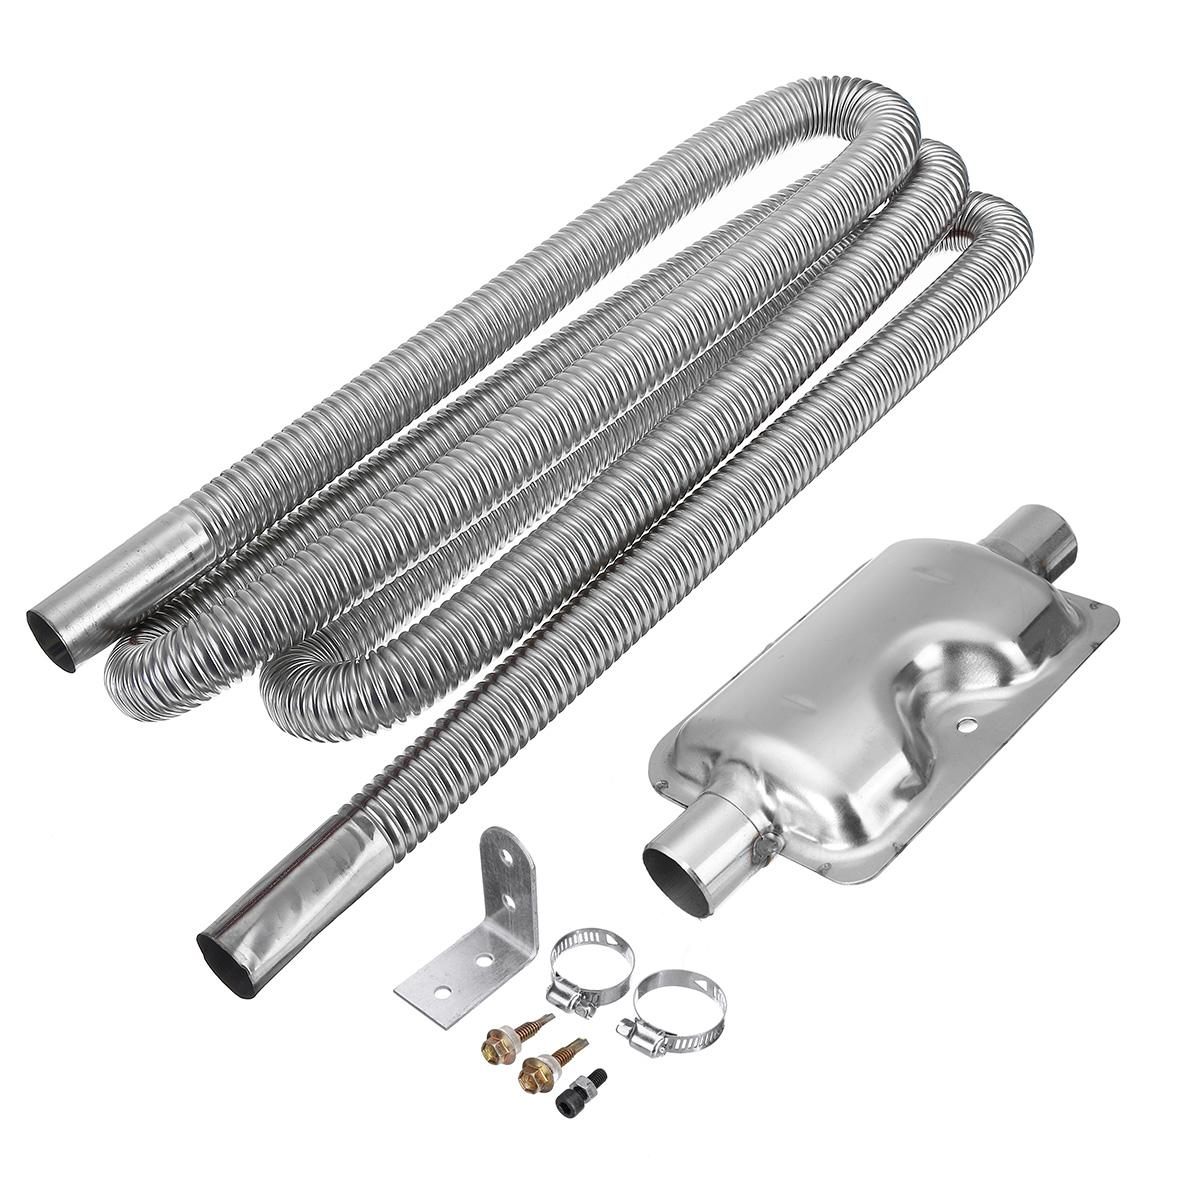 100cm Stainless Steel Exhaust Pipe Silencer Car Parking Air Diesel Heater Kit